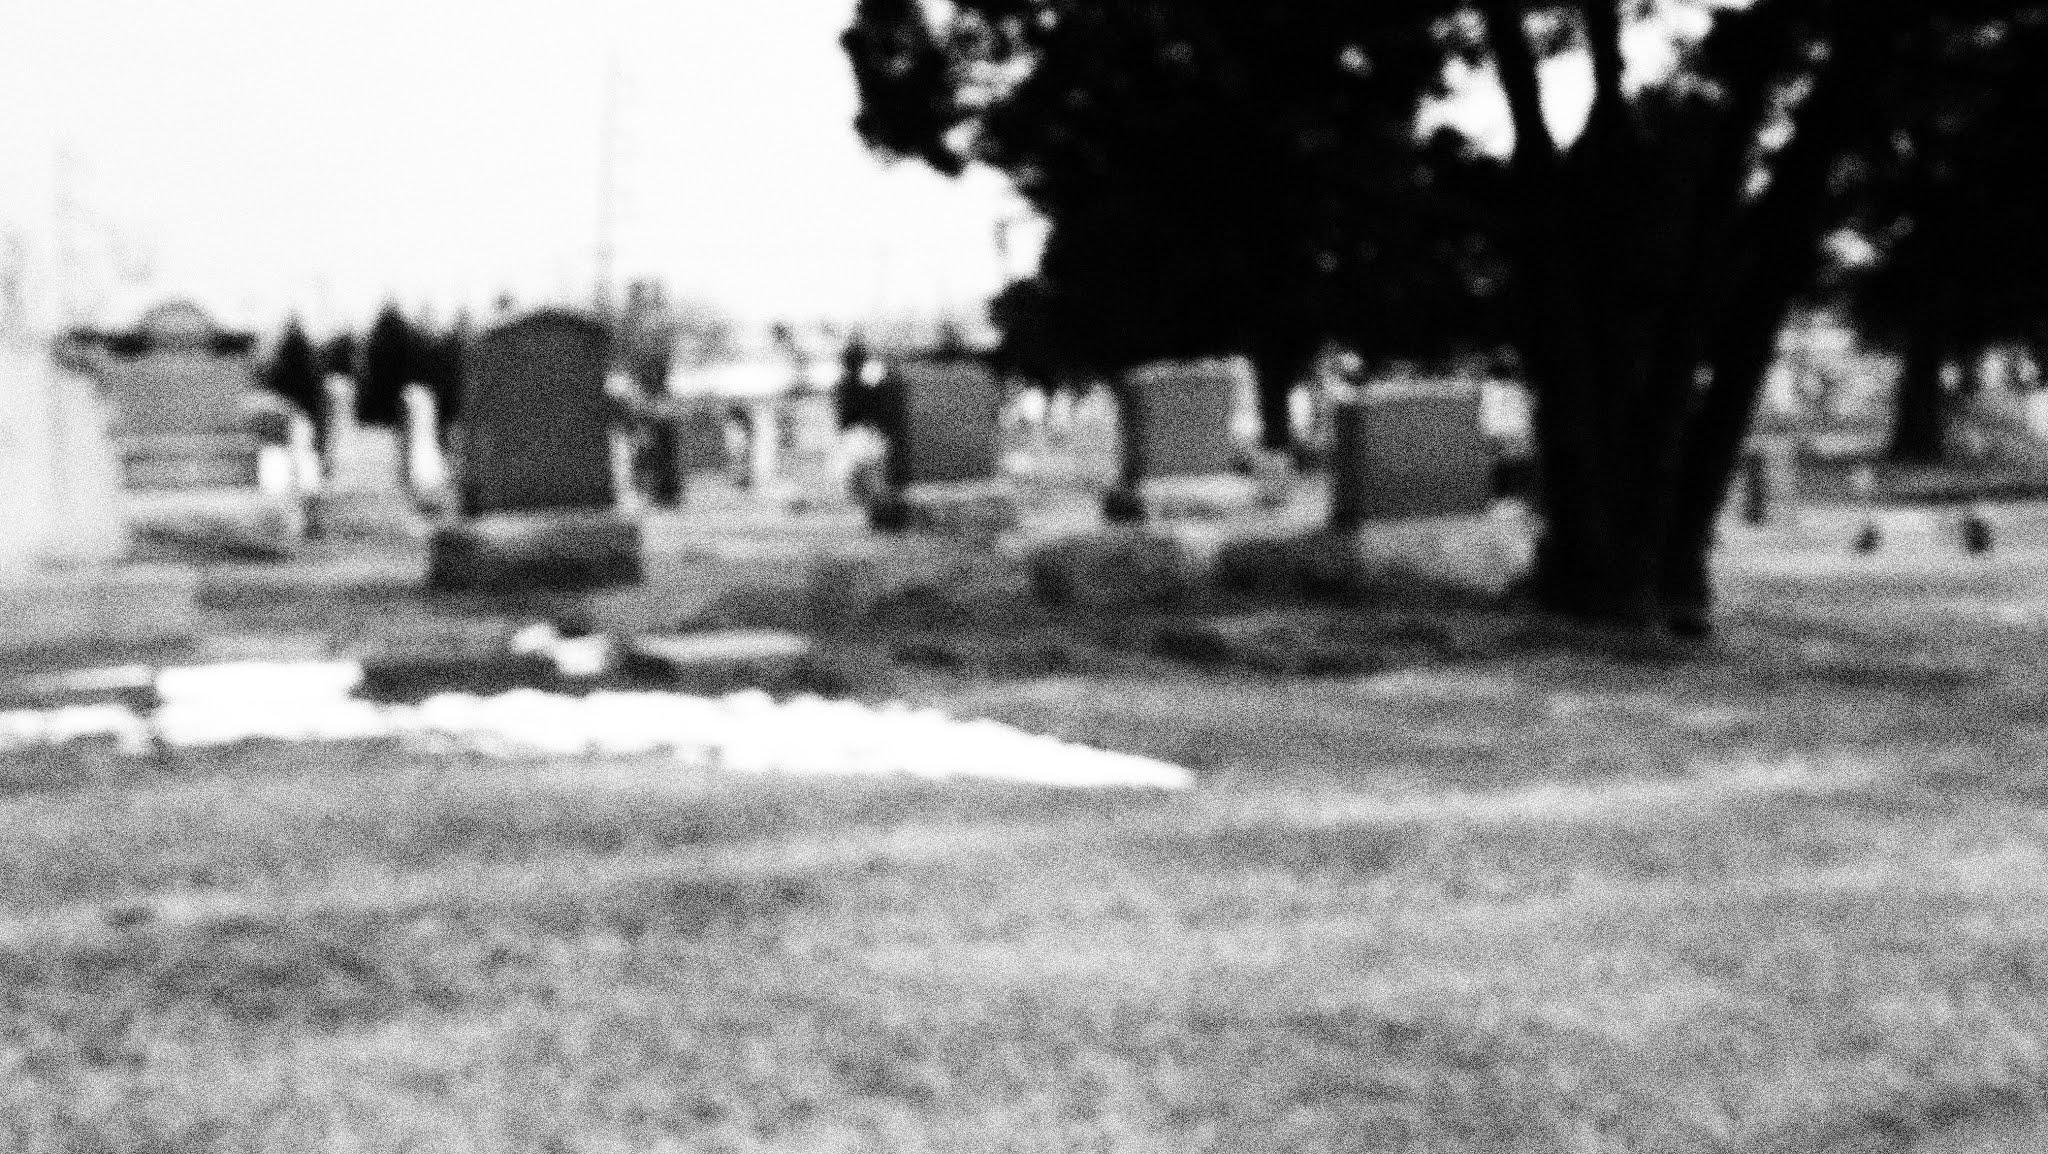 Shiloh Cemetery Hiawatha Cedar Rapids Iowa